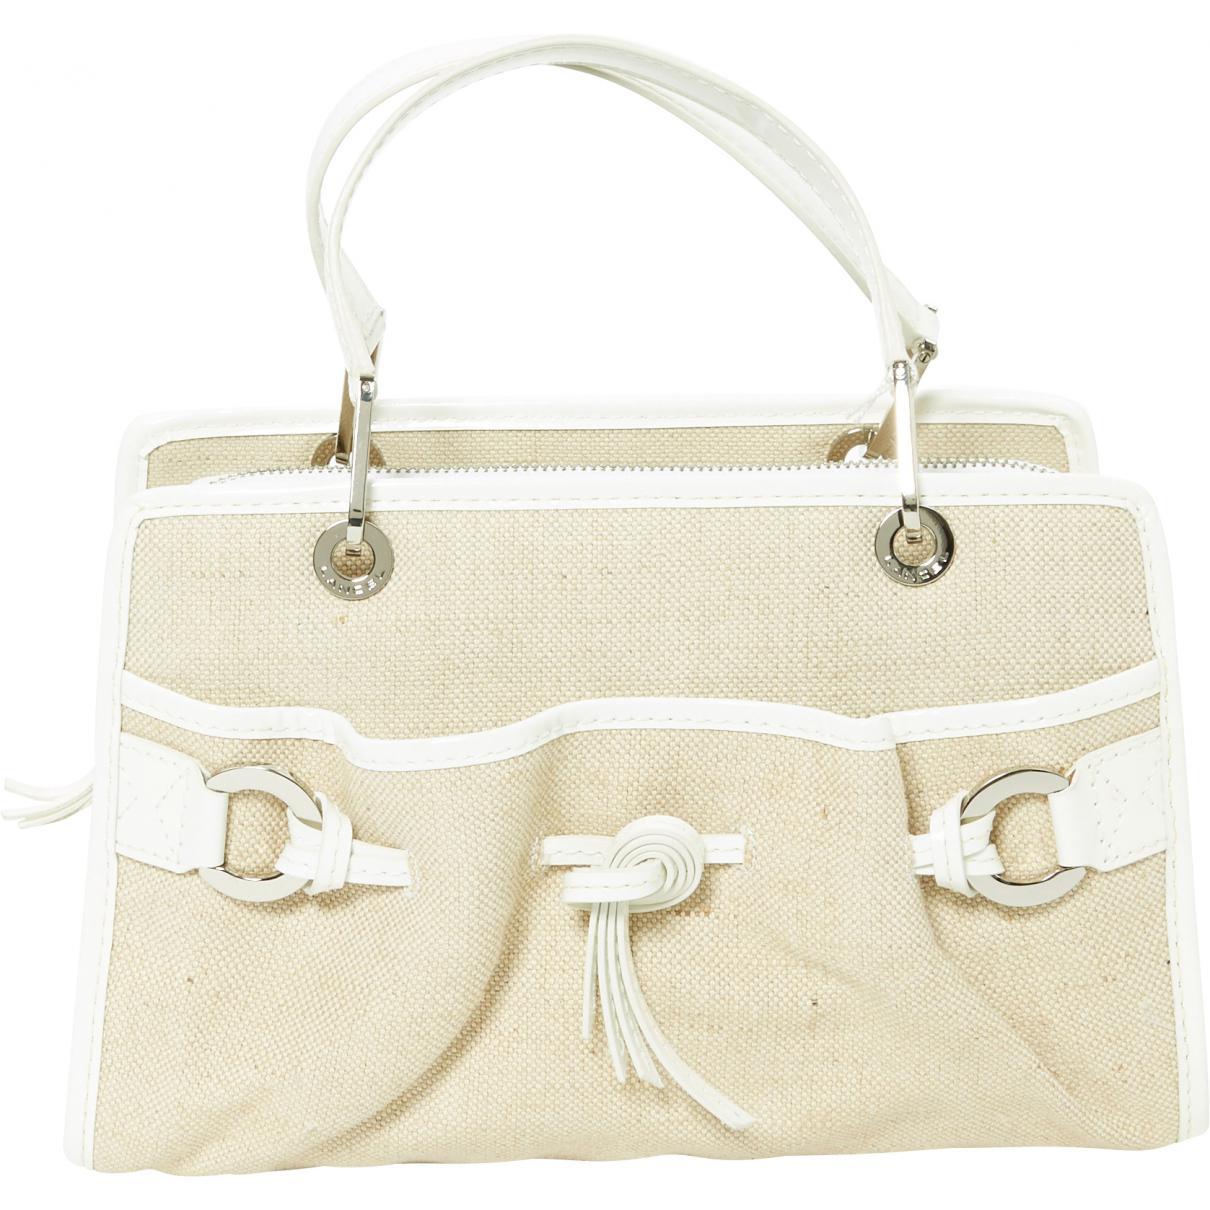 Lancel Pre-owned - Cloth handbag bj7MOUu